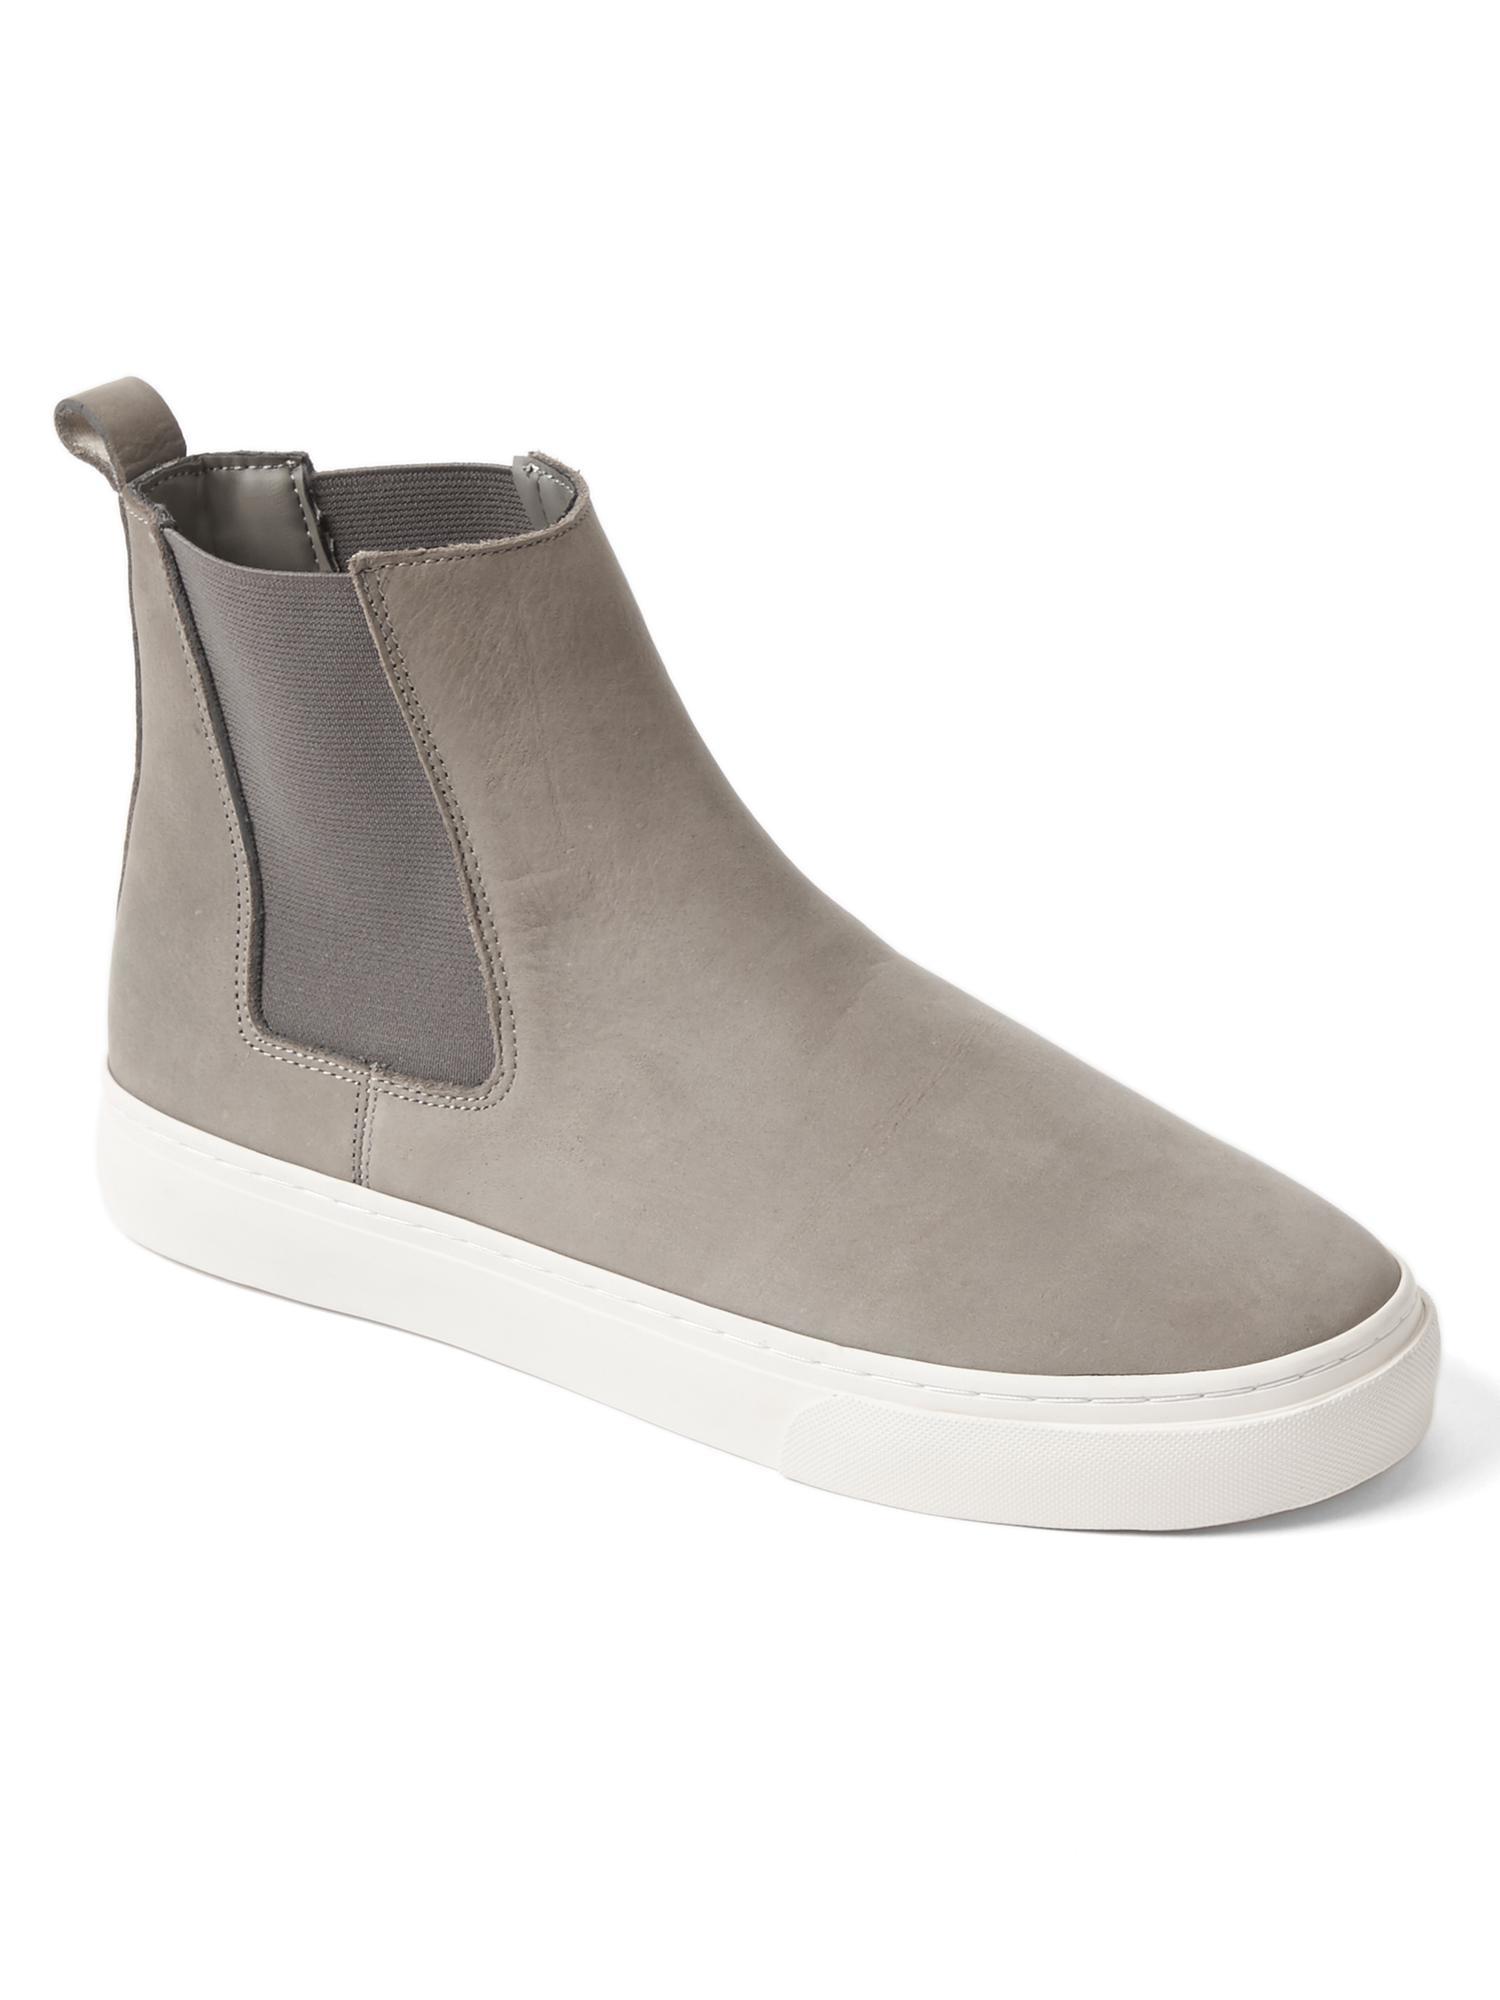 Gap Chelsea Boot Sneakers In Gray Light Grey Lyst